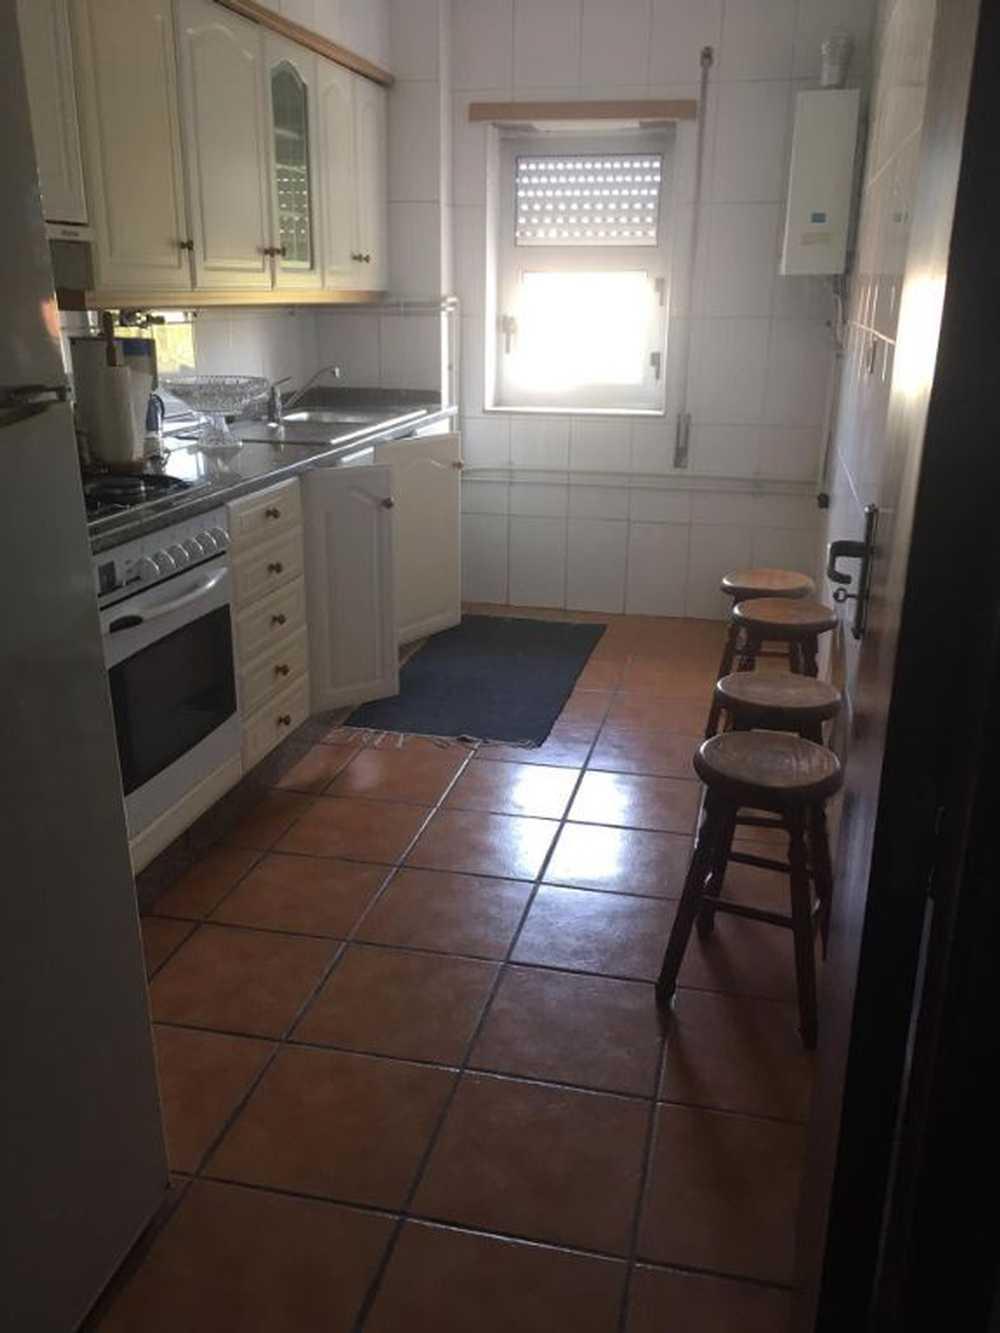 Meixedo Bragança 公寓 照片 #request.properties.id#